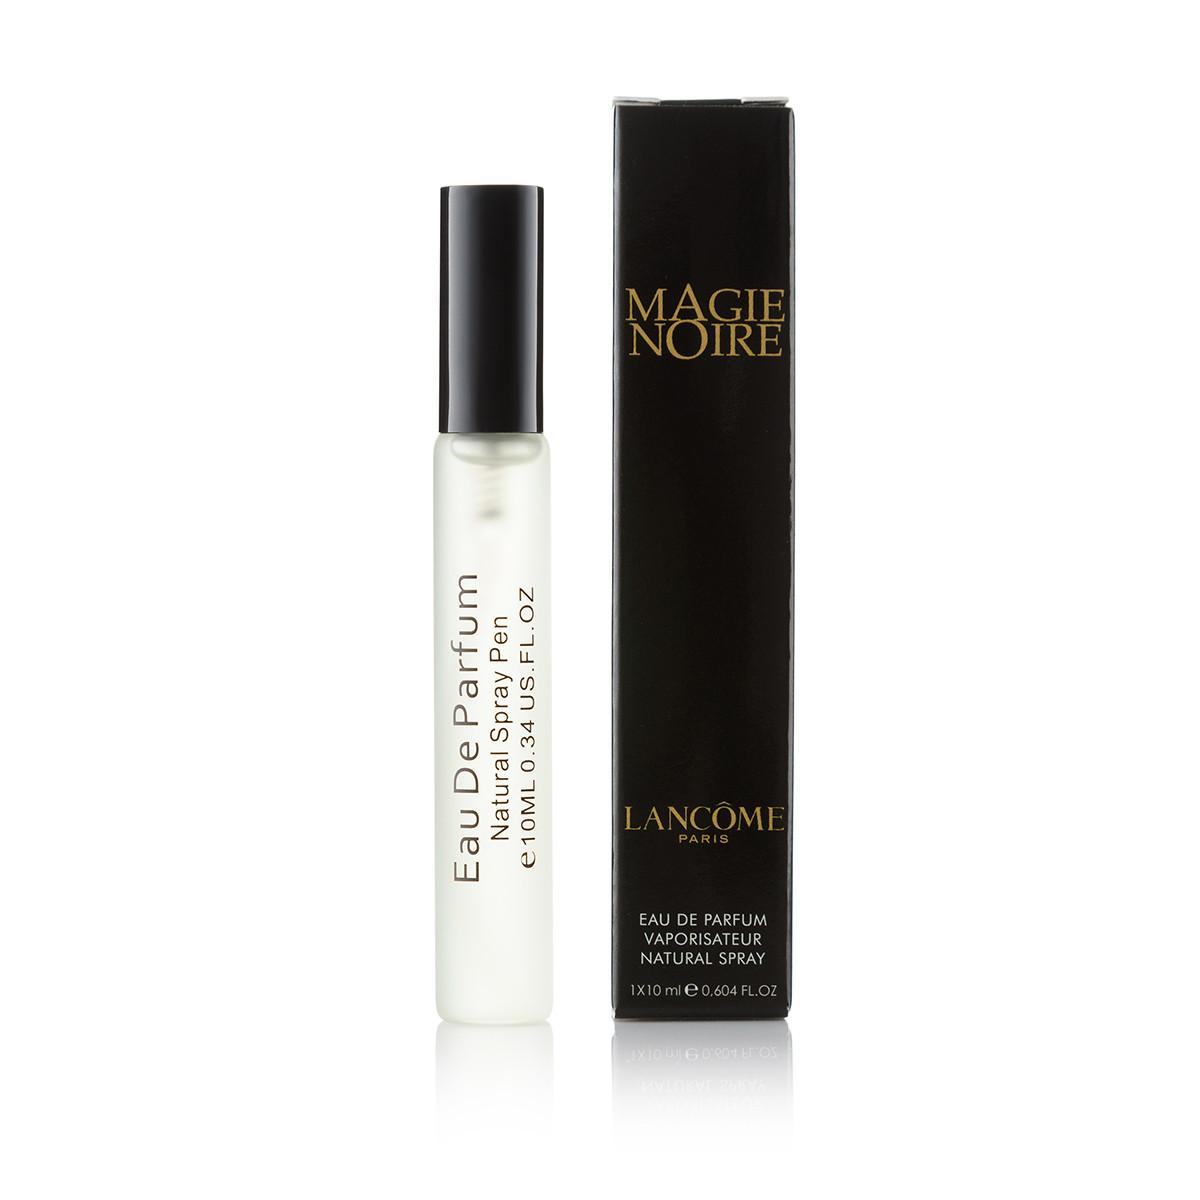 10 мл мини парфюм спрей Lancome Magie Noire (Ж) Д-60